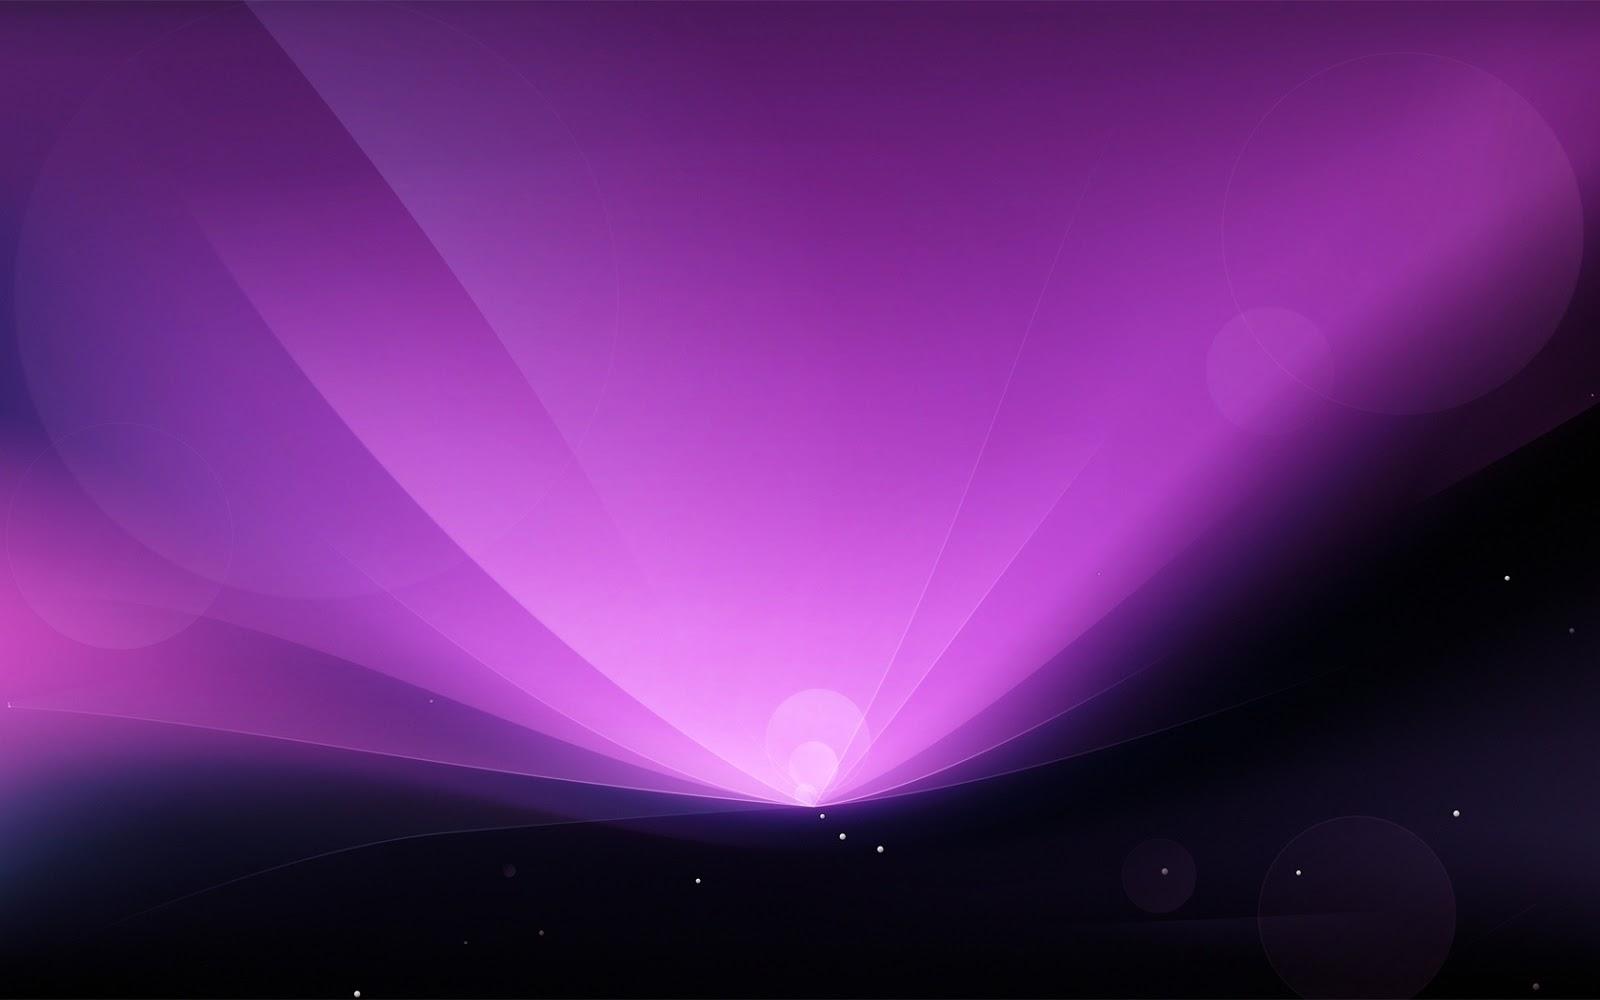 Fondos de pantalla imagenes paisajes wallpapers hd 3d for Imagenes 3d hd con movimiento